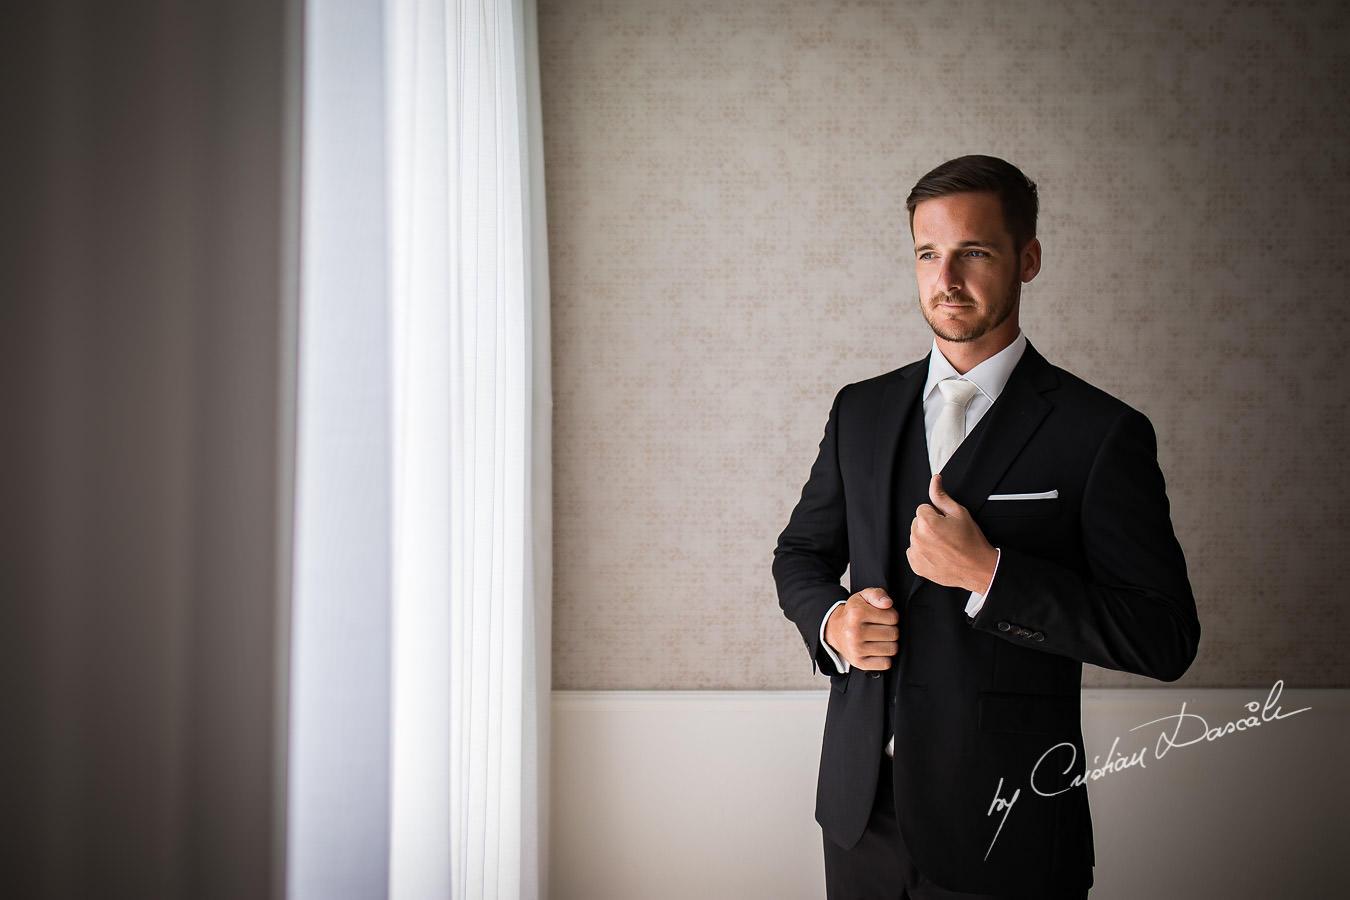 Stylish groom portraiture captured by Cristian Dascalu during an elegant Aphrodite Hills Wedding in Cyprus.